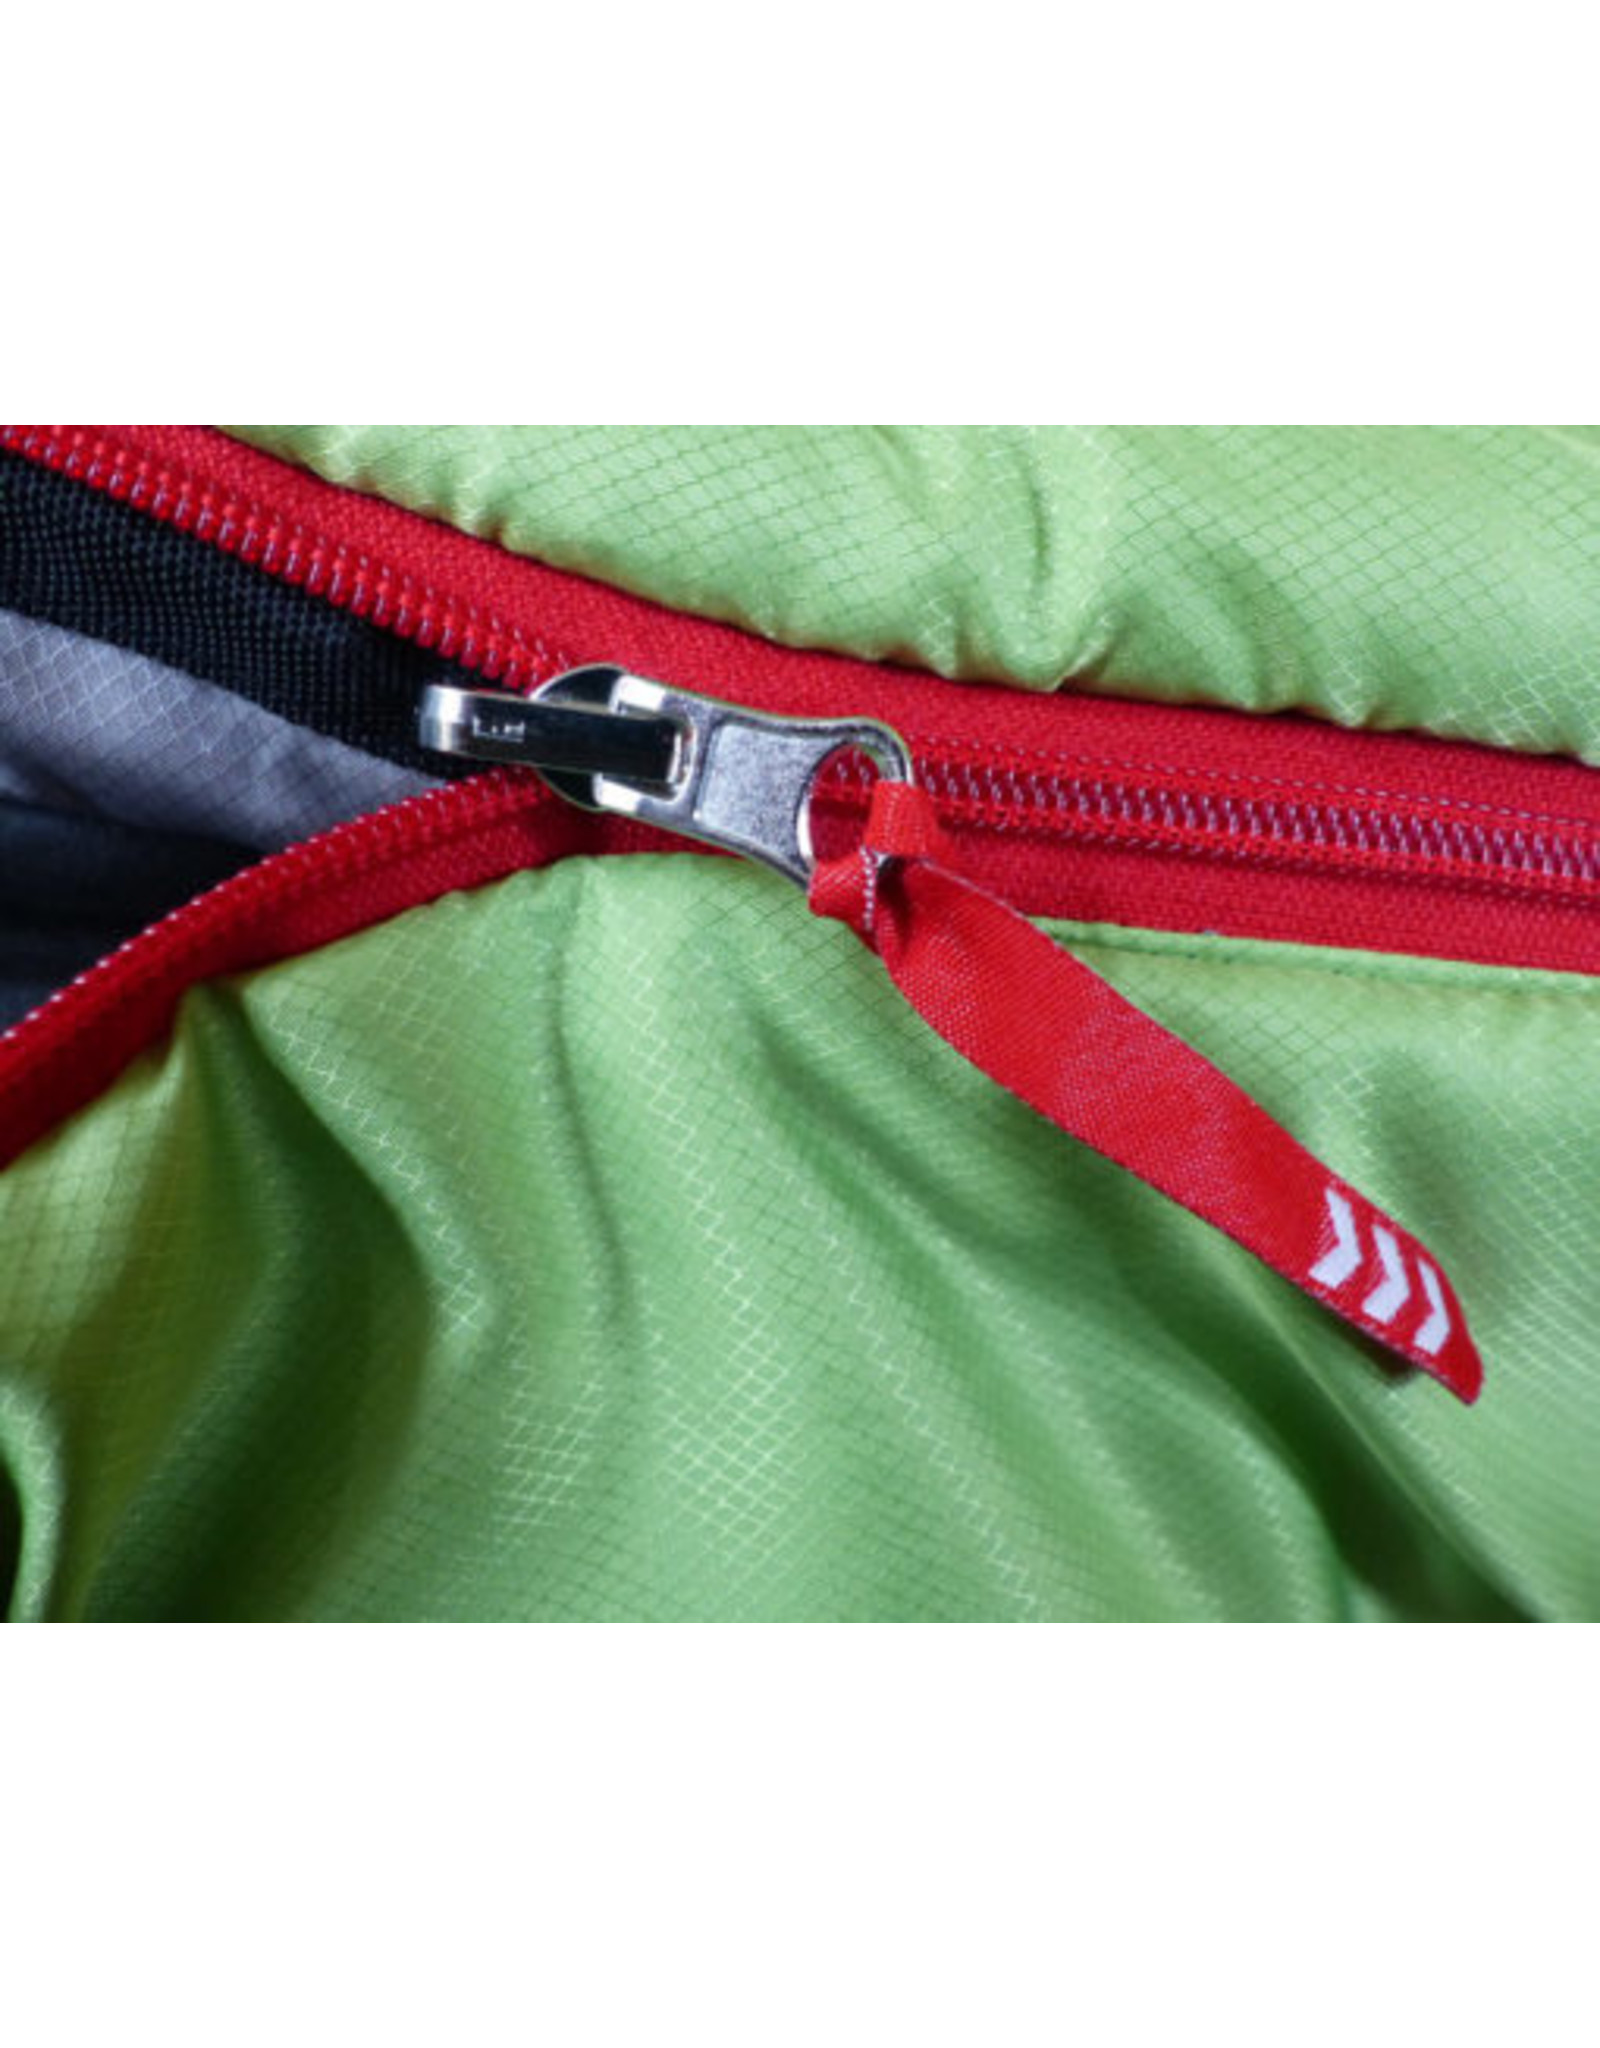 HOTCORE ROMA 200 LE Sleeping Bag/Comfort: 0°C (32°F) Limit: -10°C (14°F)